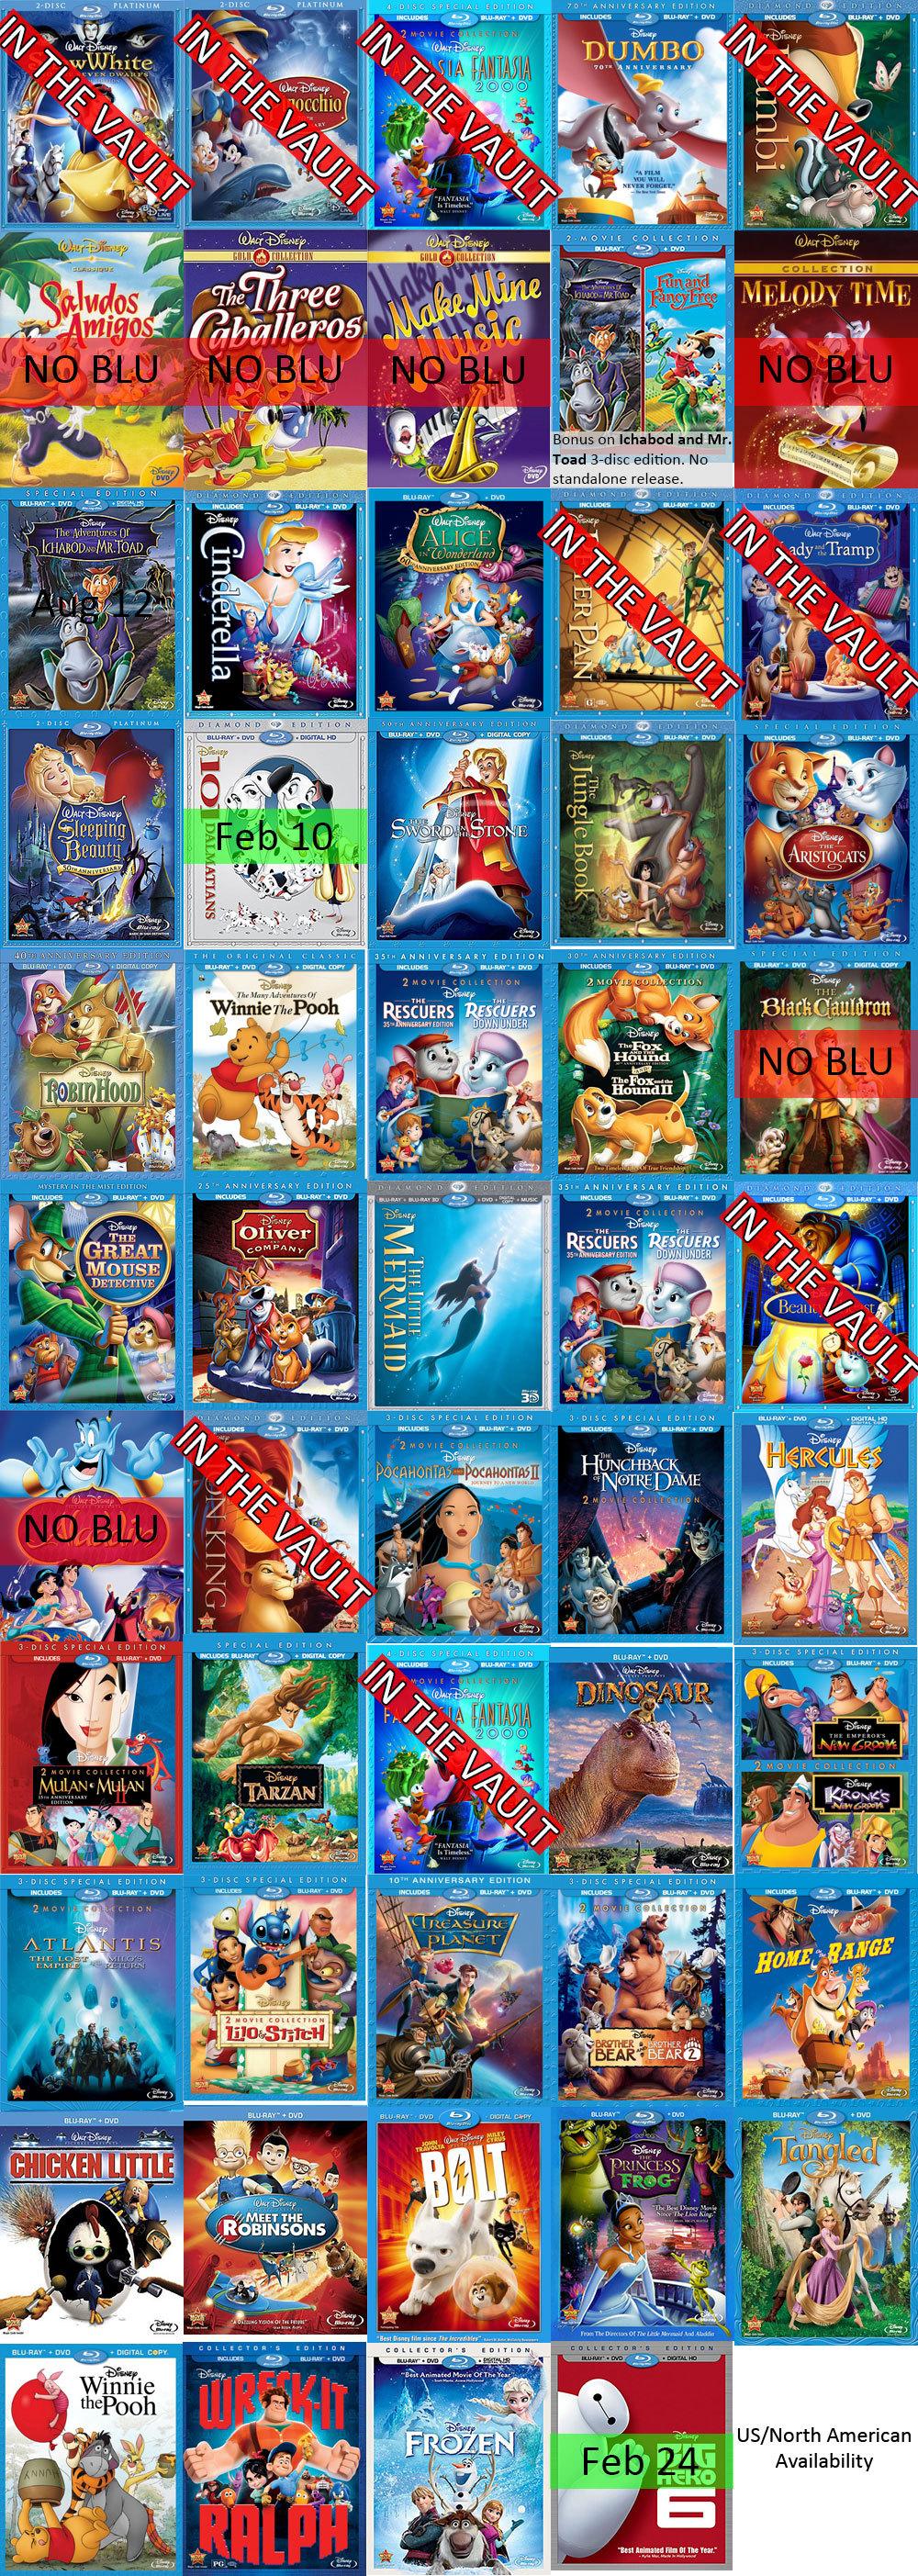 Disneys movie club official